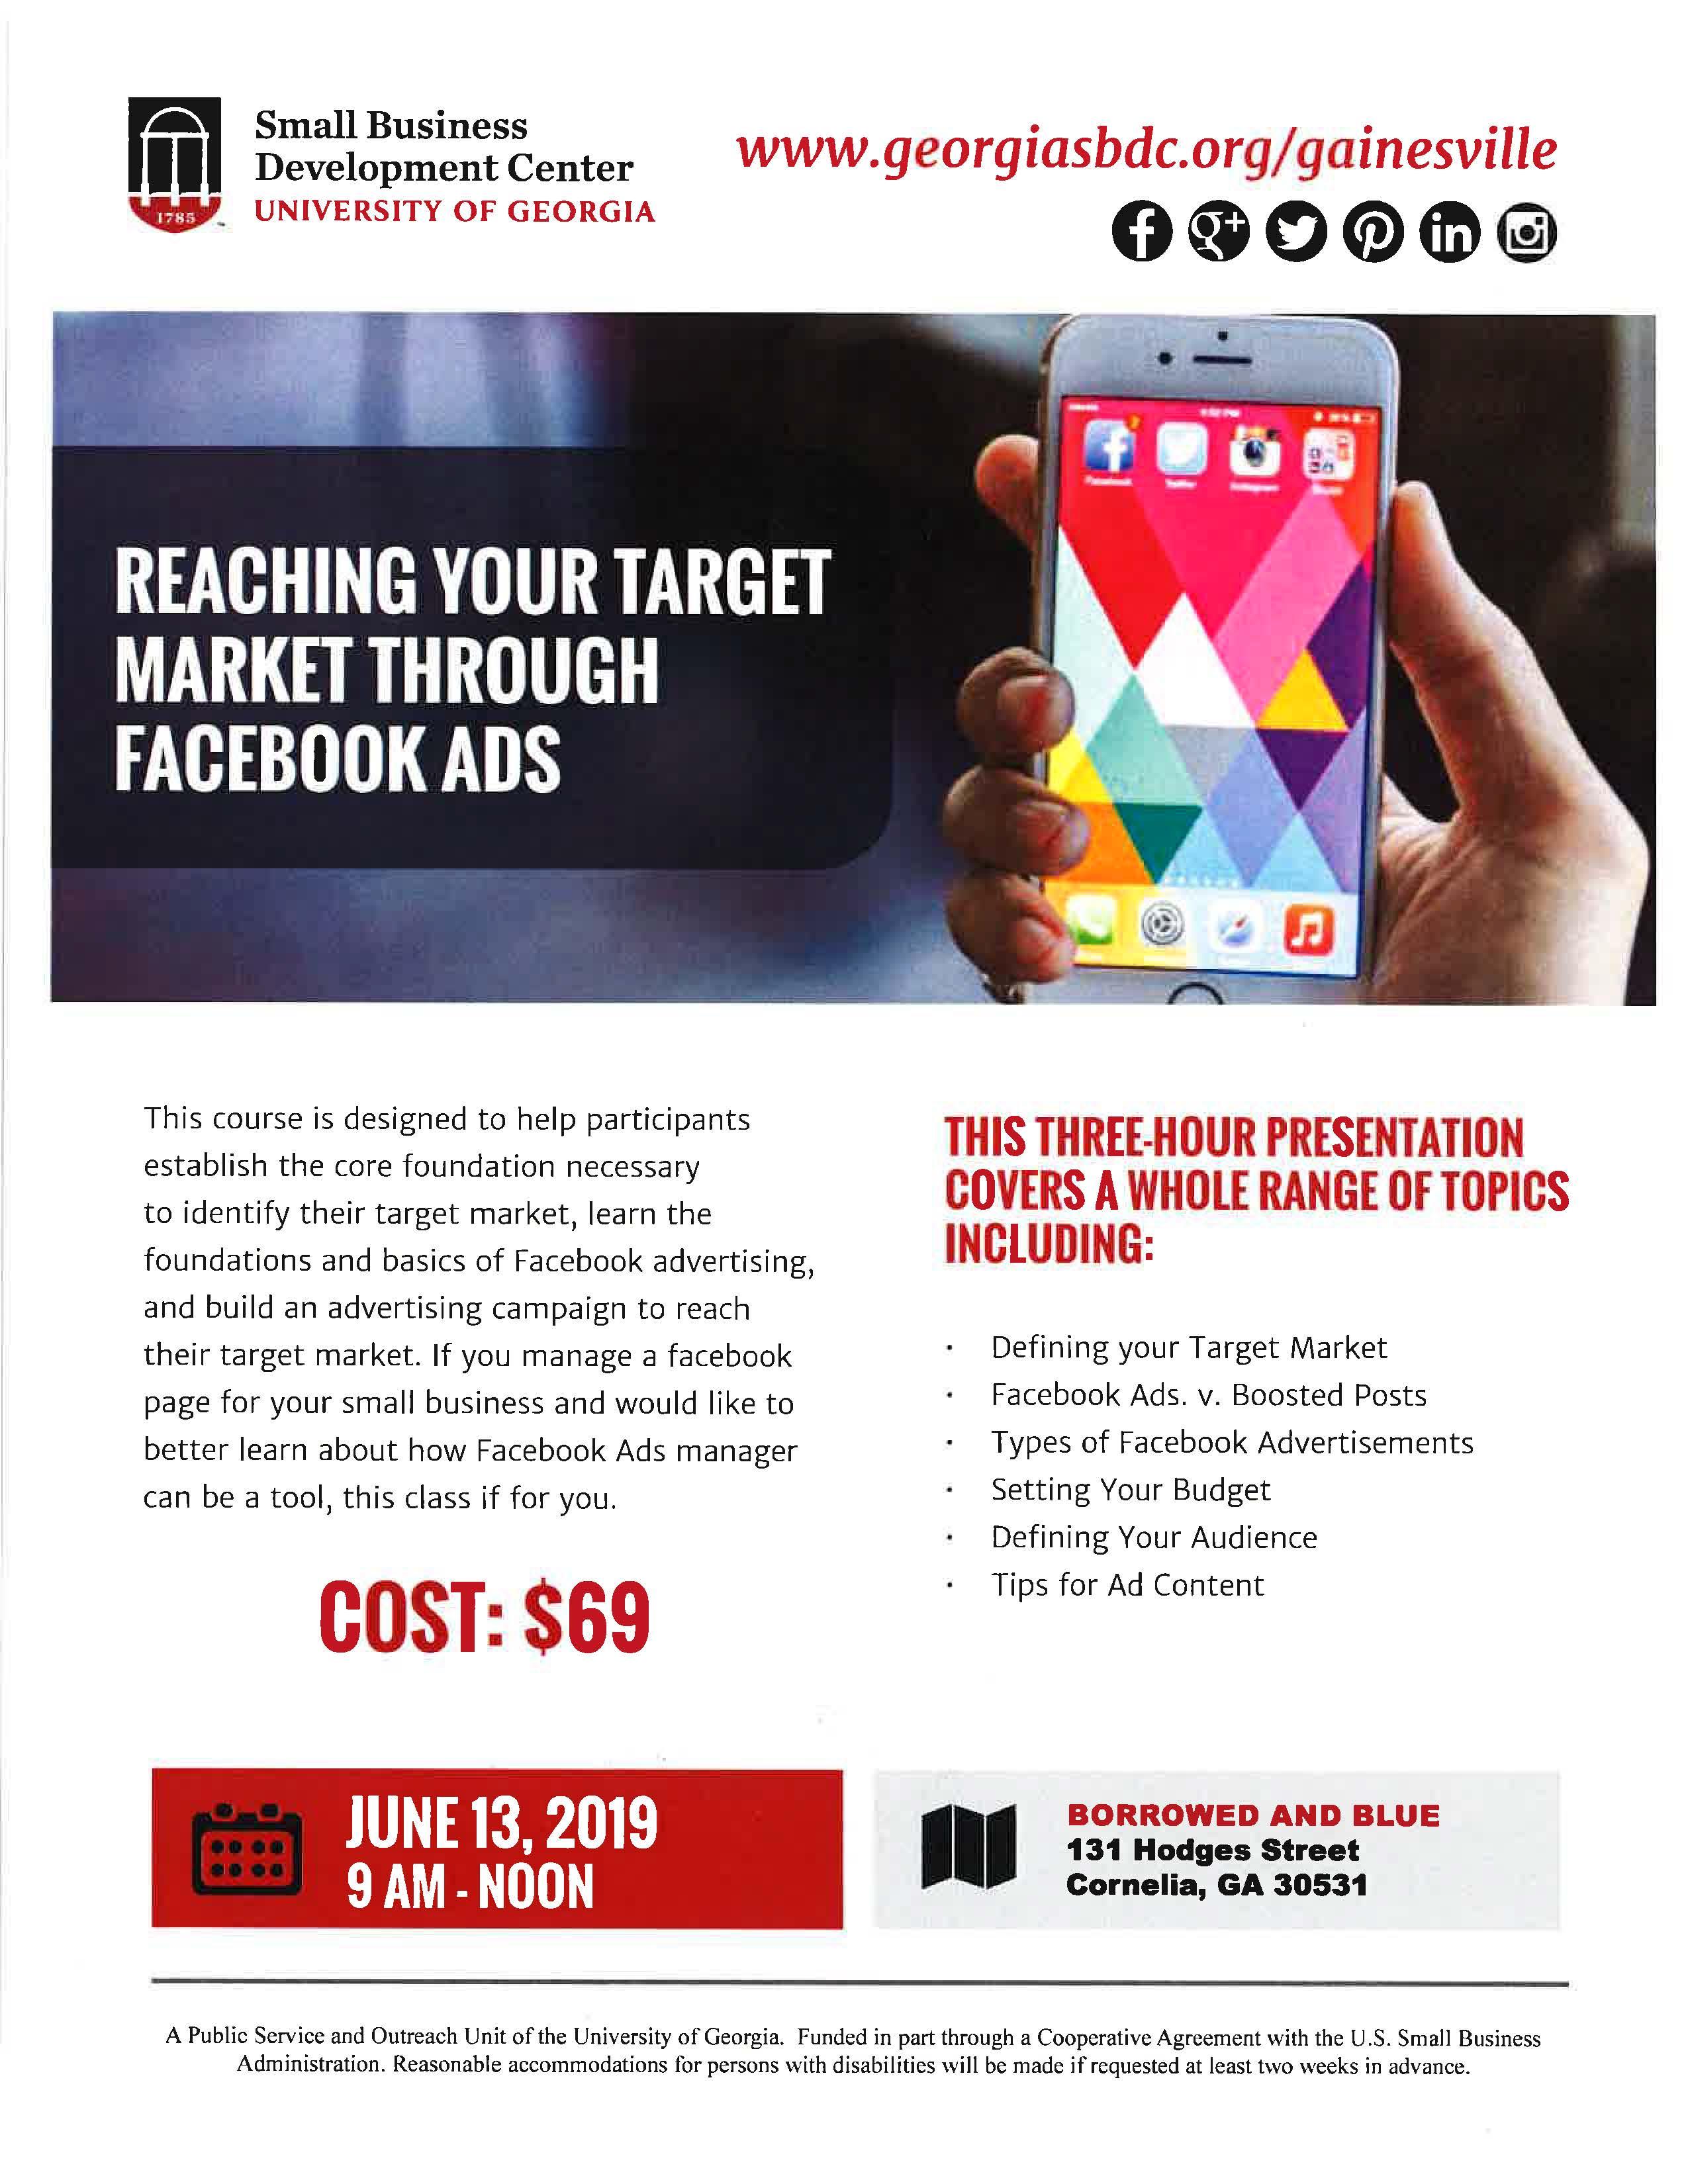 Reaching Your Target Market Through Facebook Ads